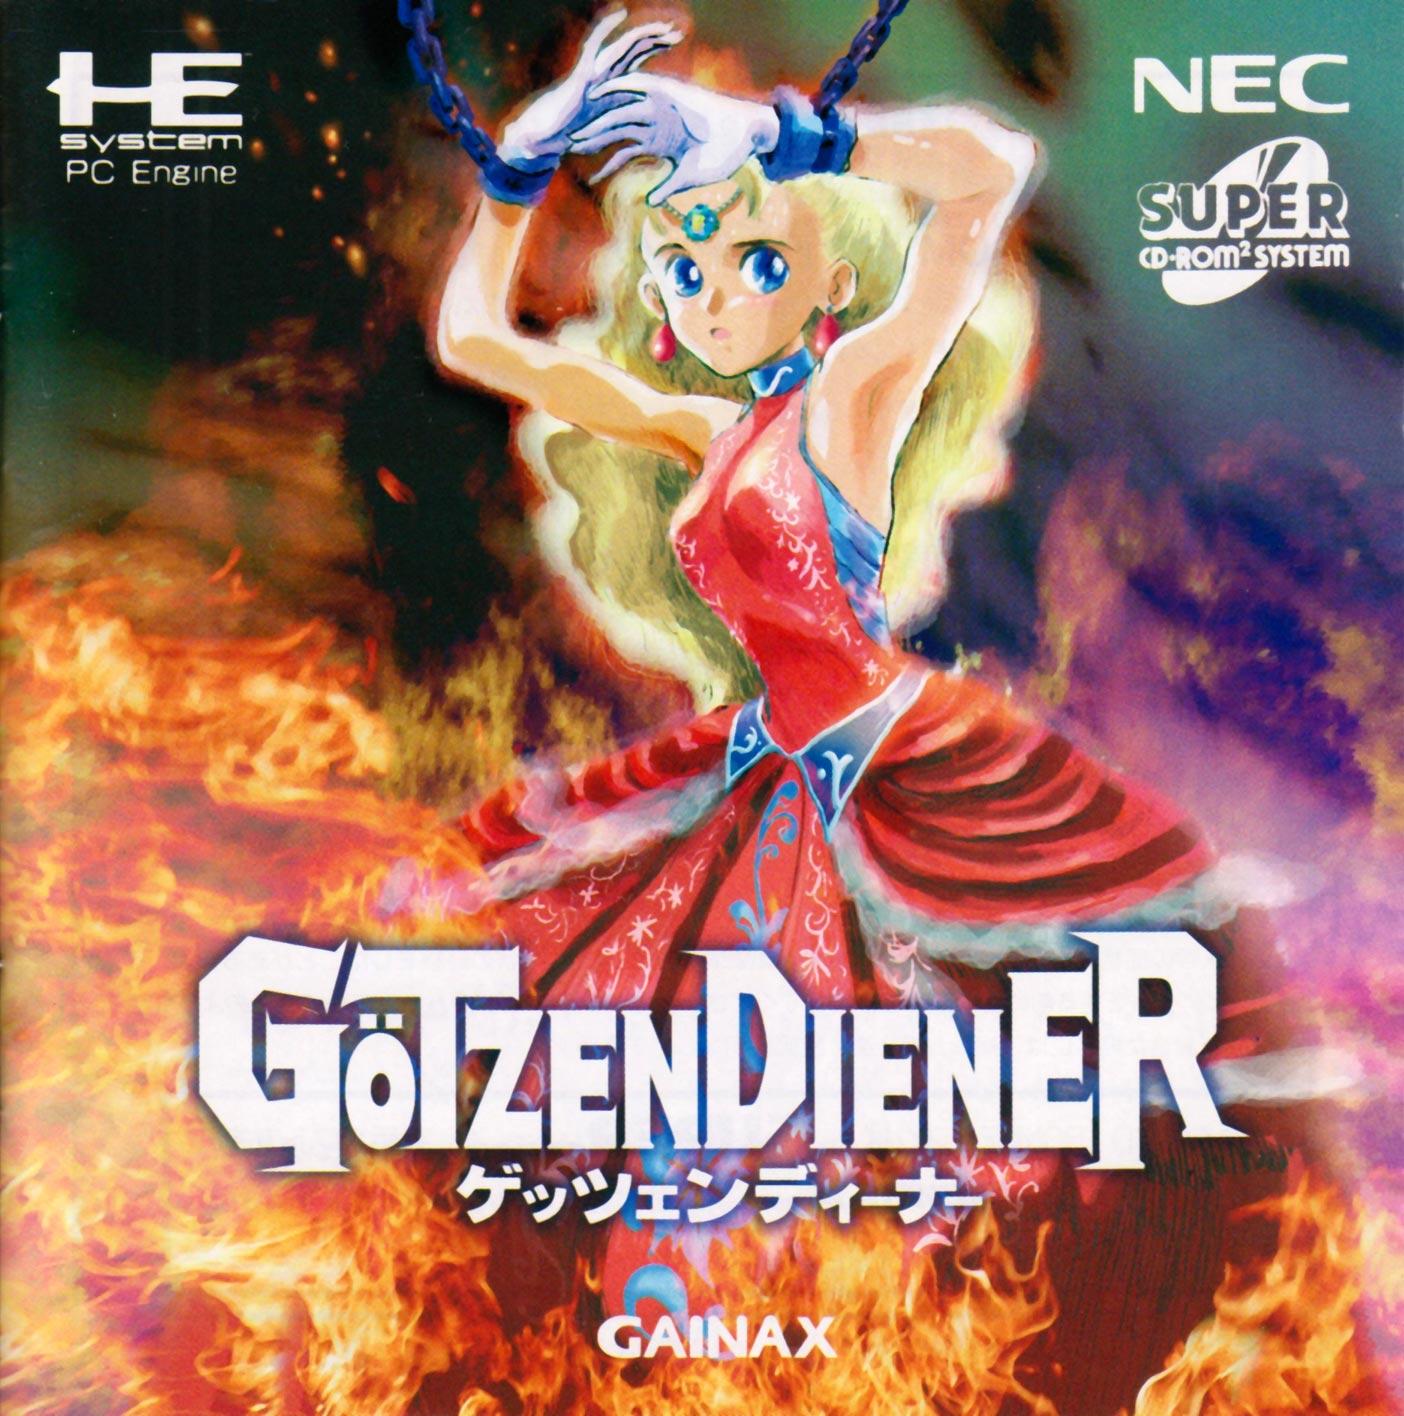 Götzendiener - The PC Engine Software Bible